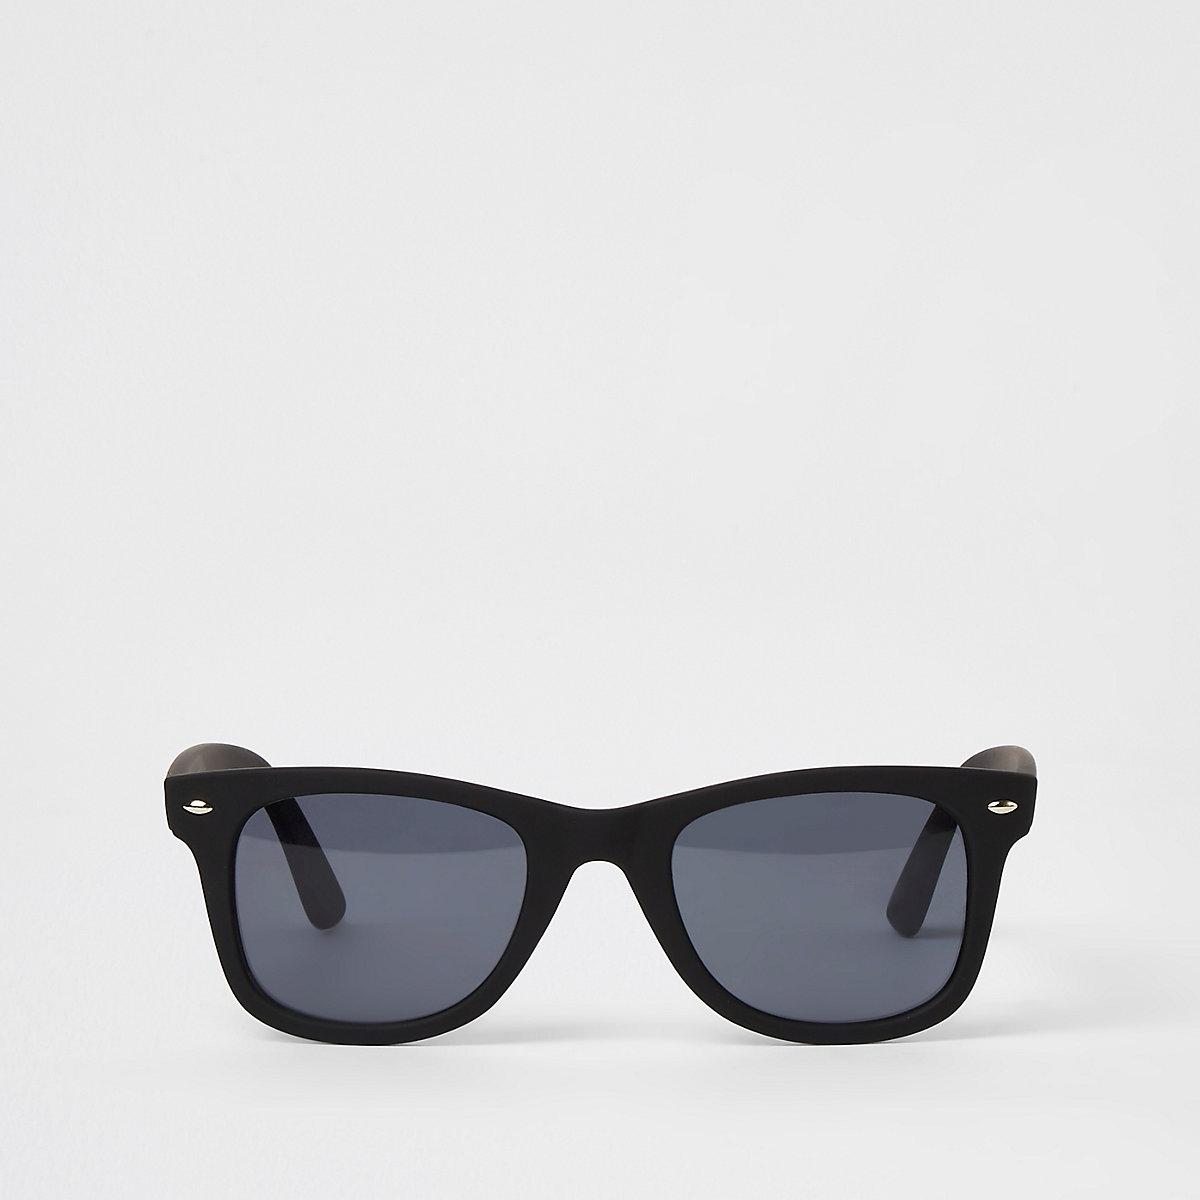 c15f876fad Black smoke lens retro square sunglasses - Retro Sunglasses ...